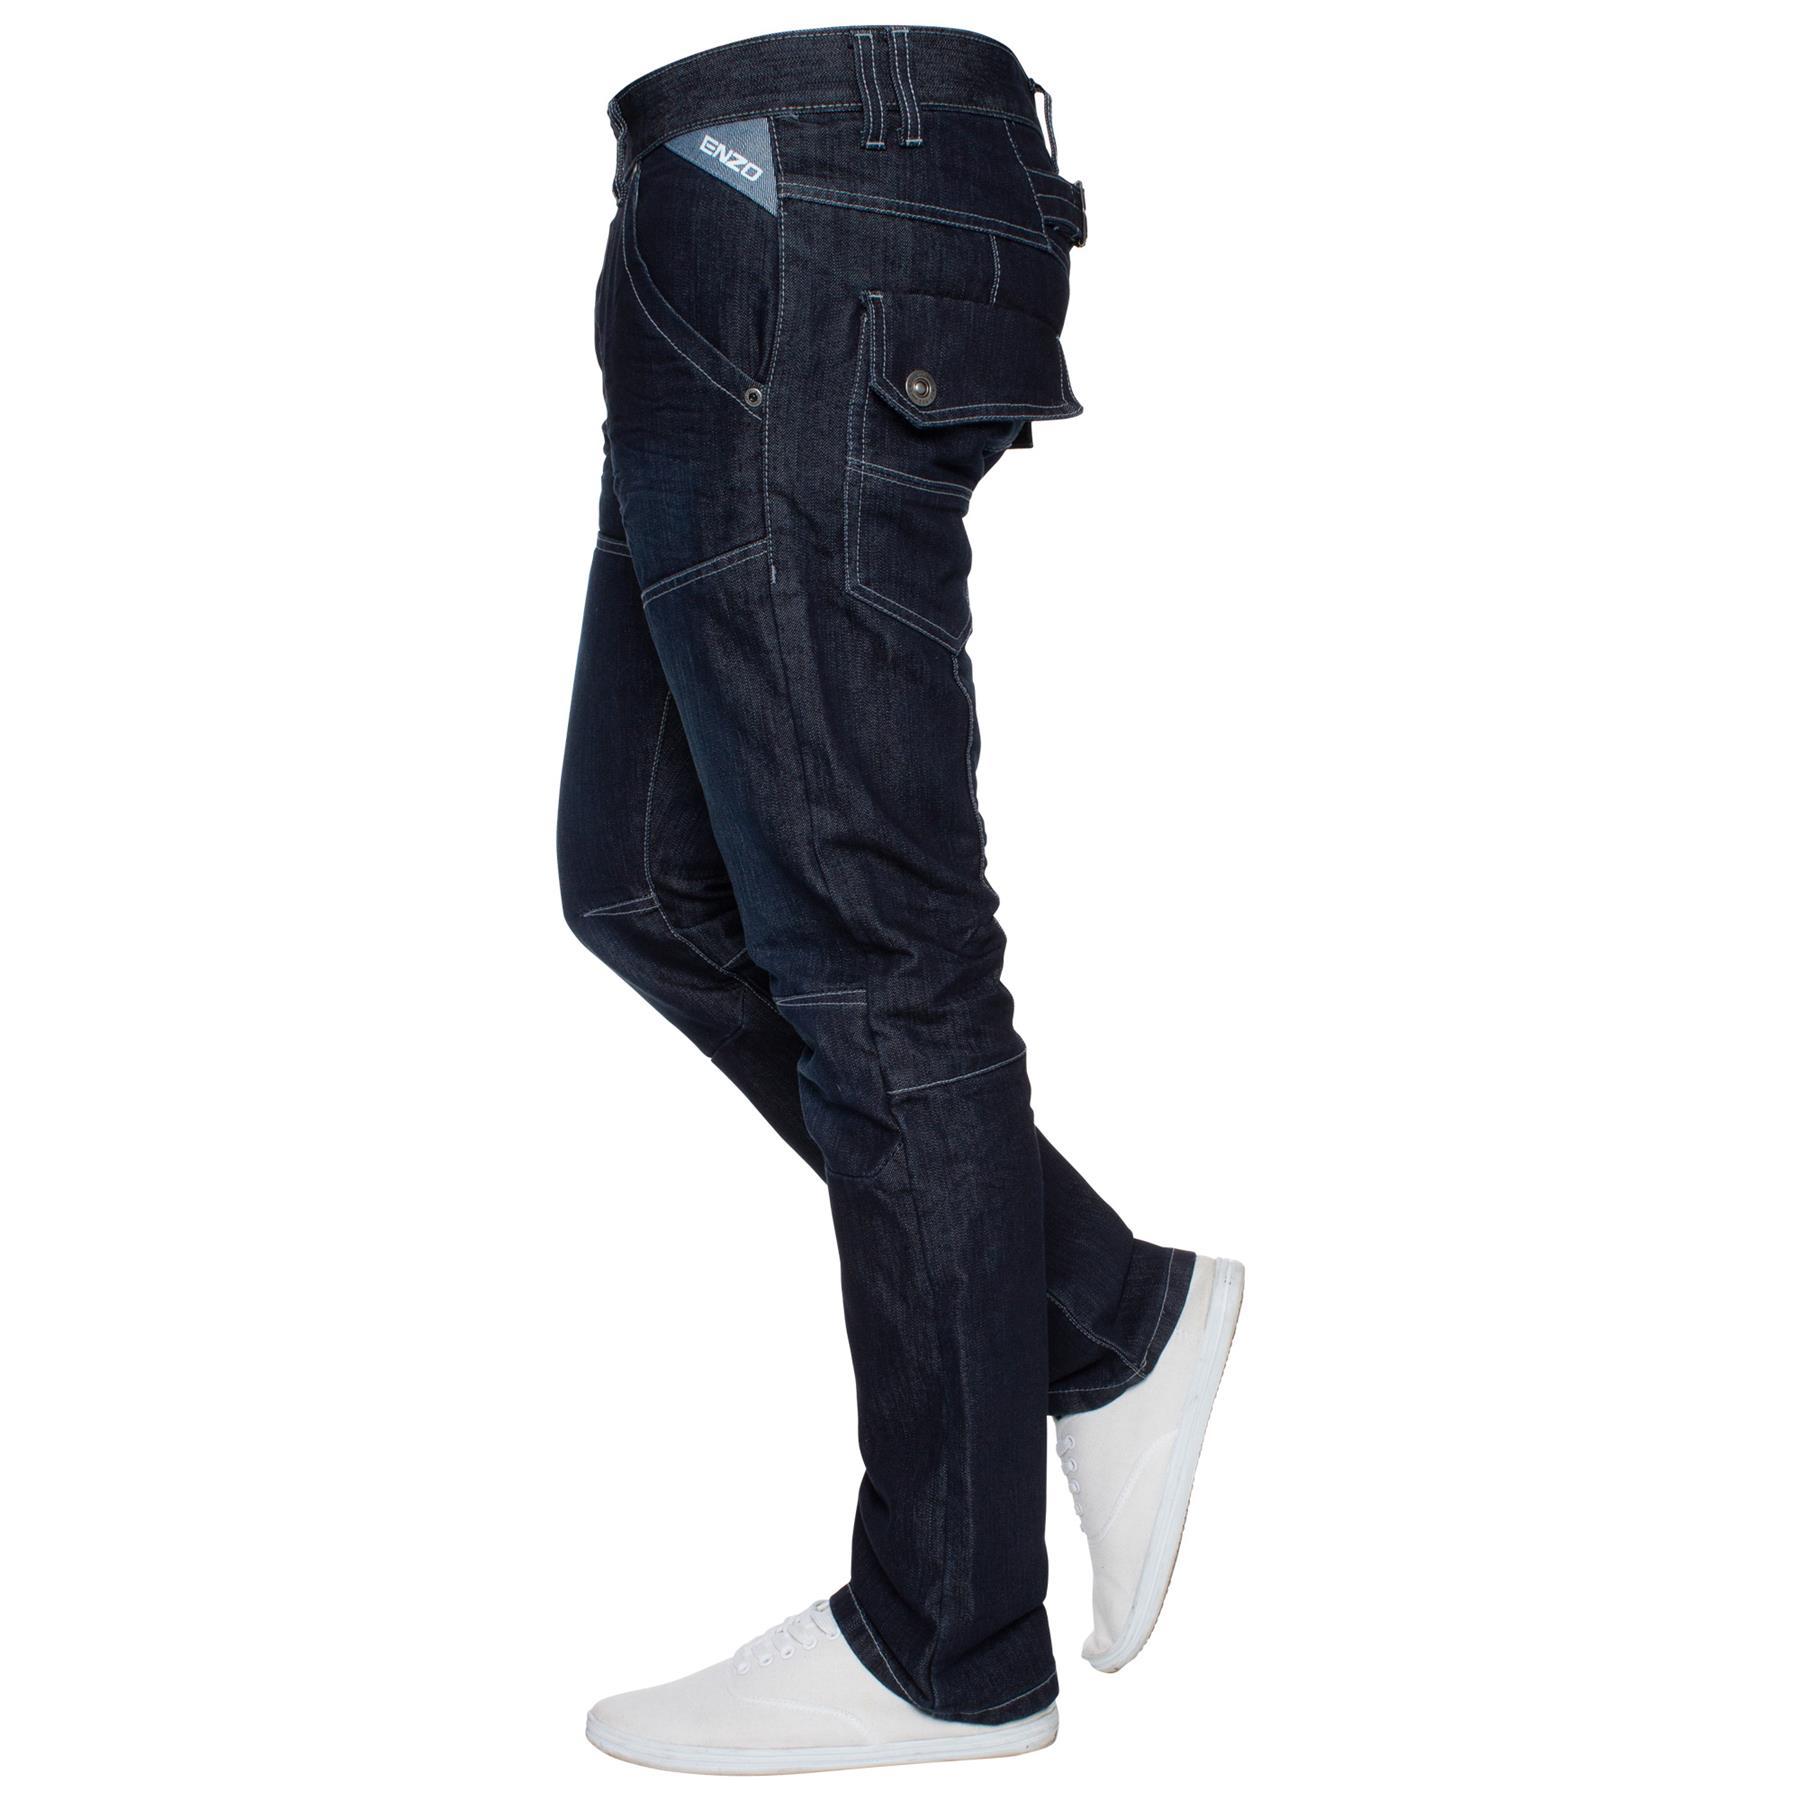 ENZO-Jeans-para-hombre-Big-Alto-Pierna-King-Size-Jeans-Pantalones-Chino-Pantalones-Pantalones-44-034 miniatura 70